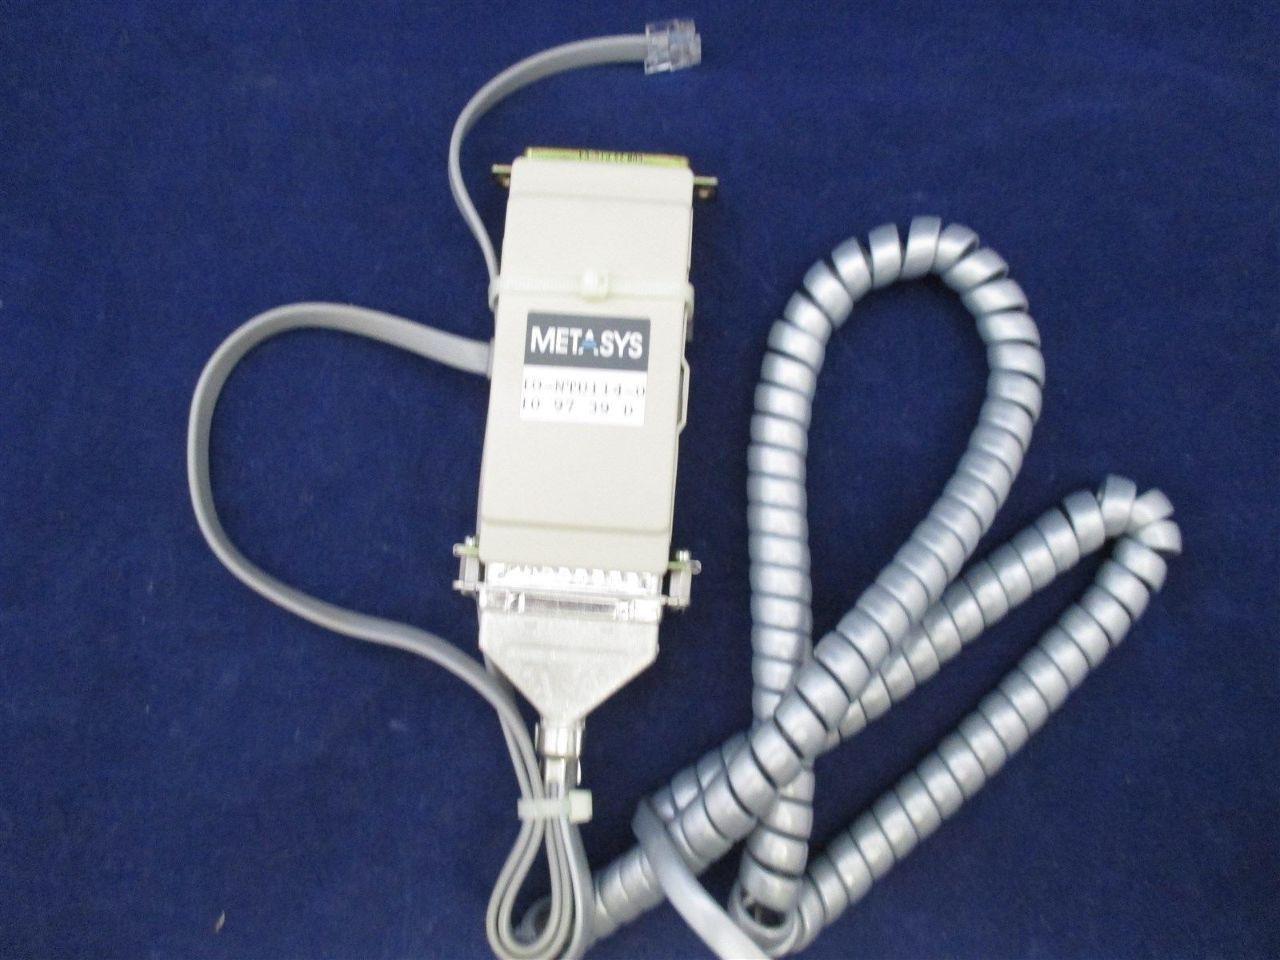 Johnson Controls IO-NTU114-0 Remote Line Driver new